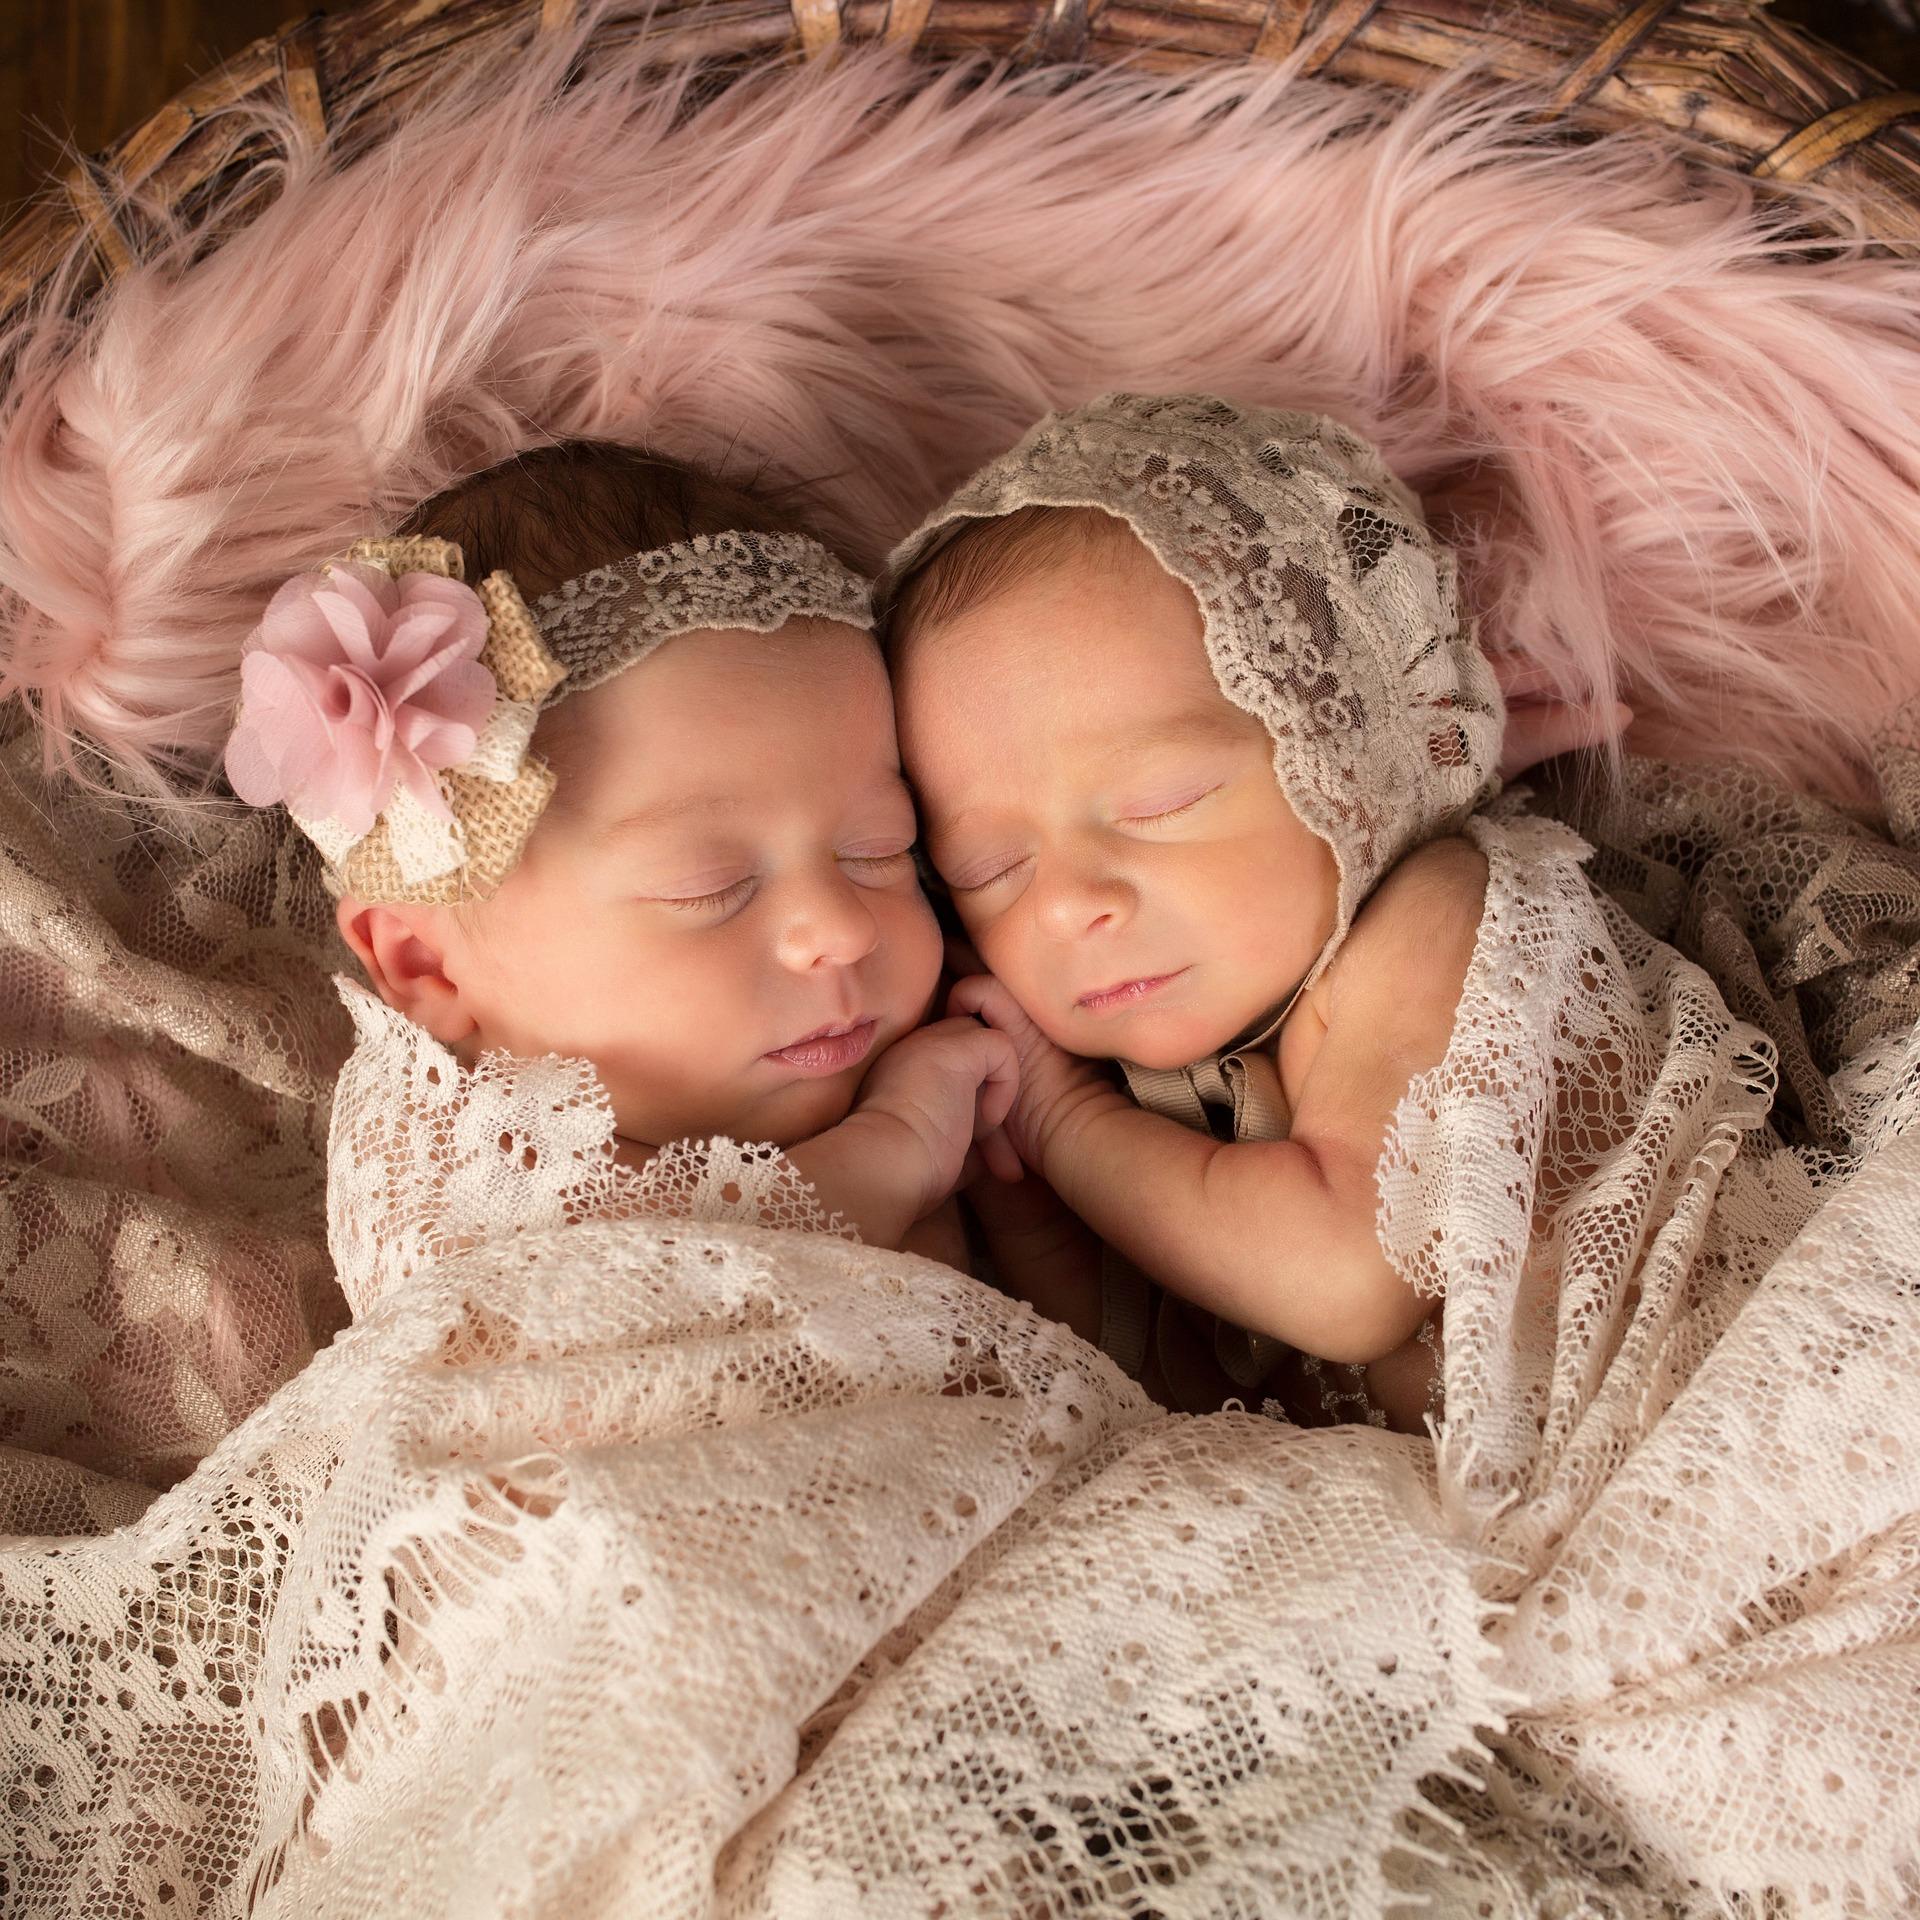 Zwillinge neugeboren aneinandergekuschelt